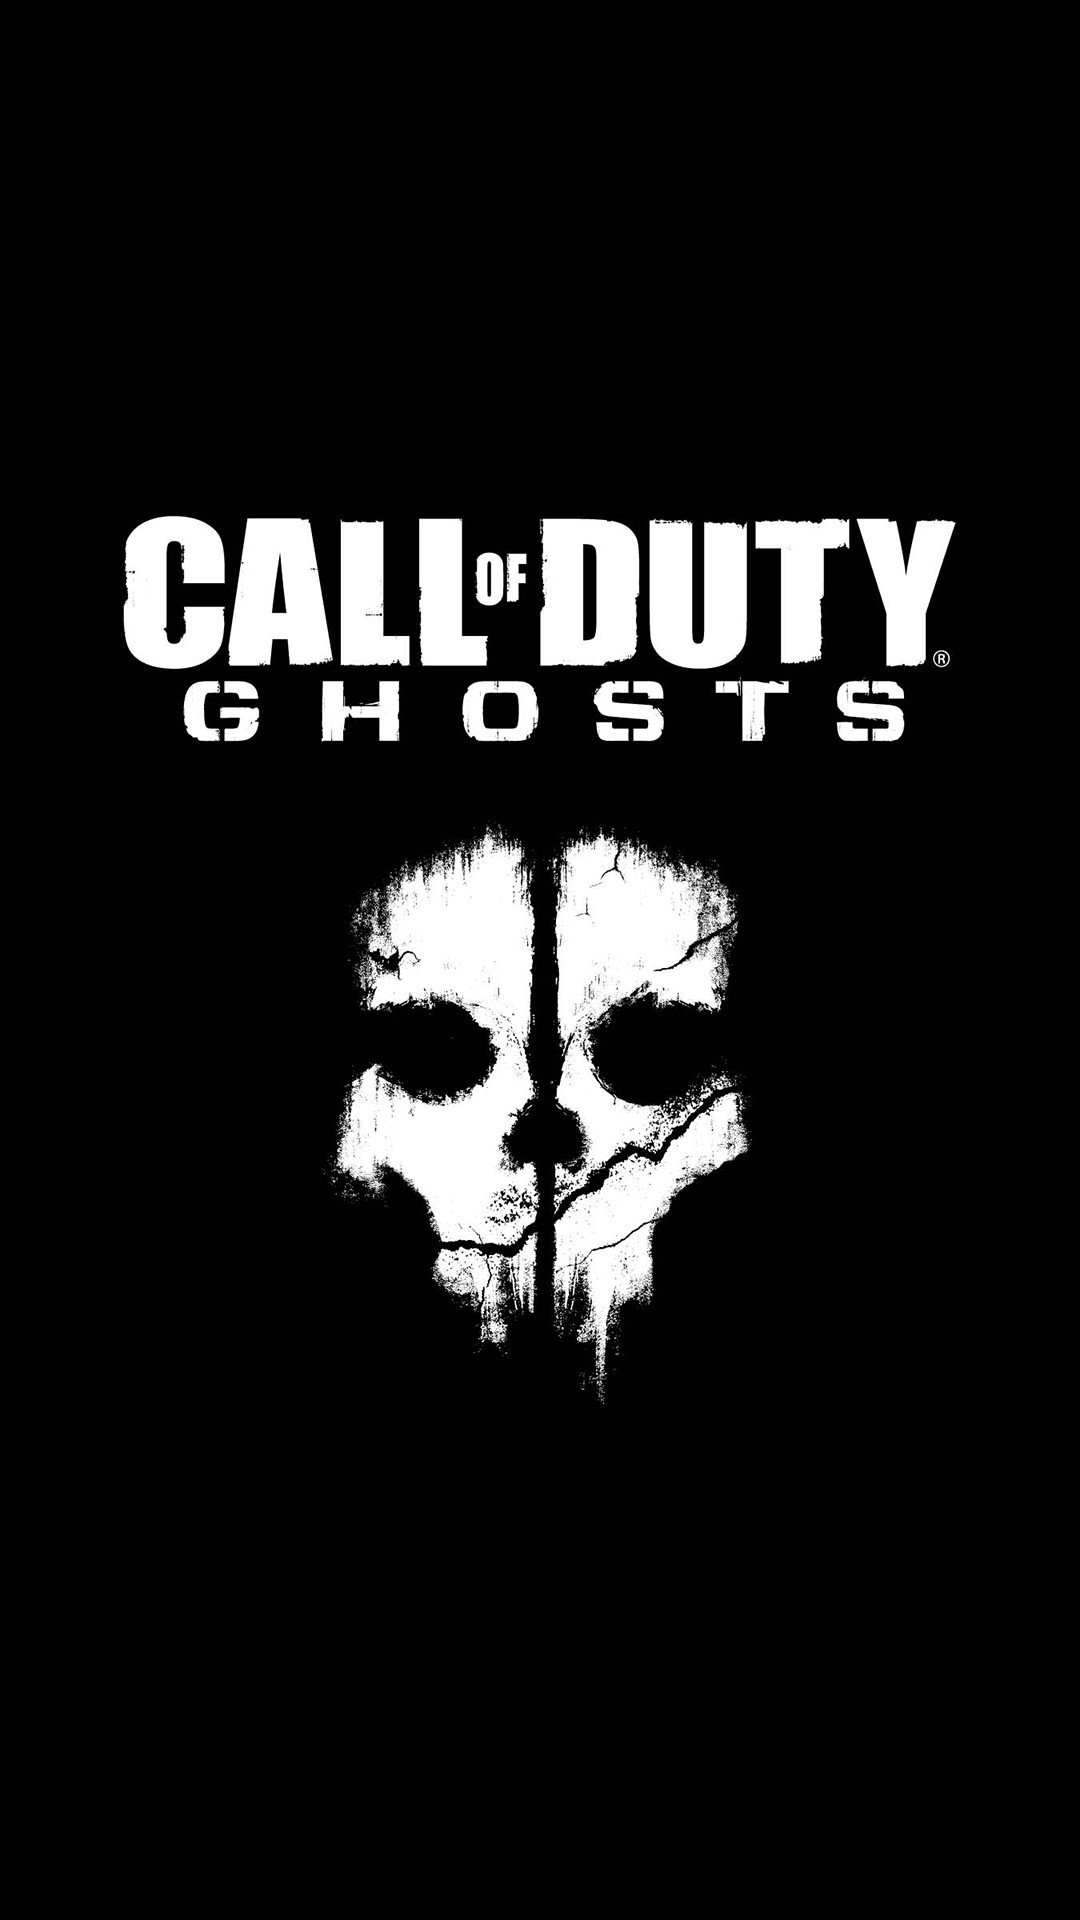 PC Game List